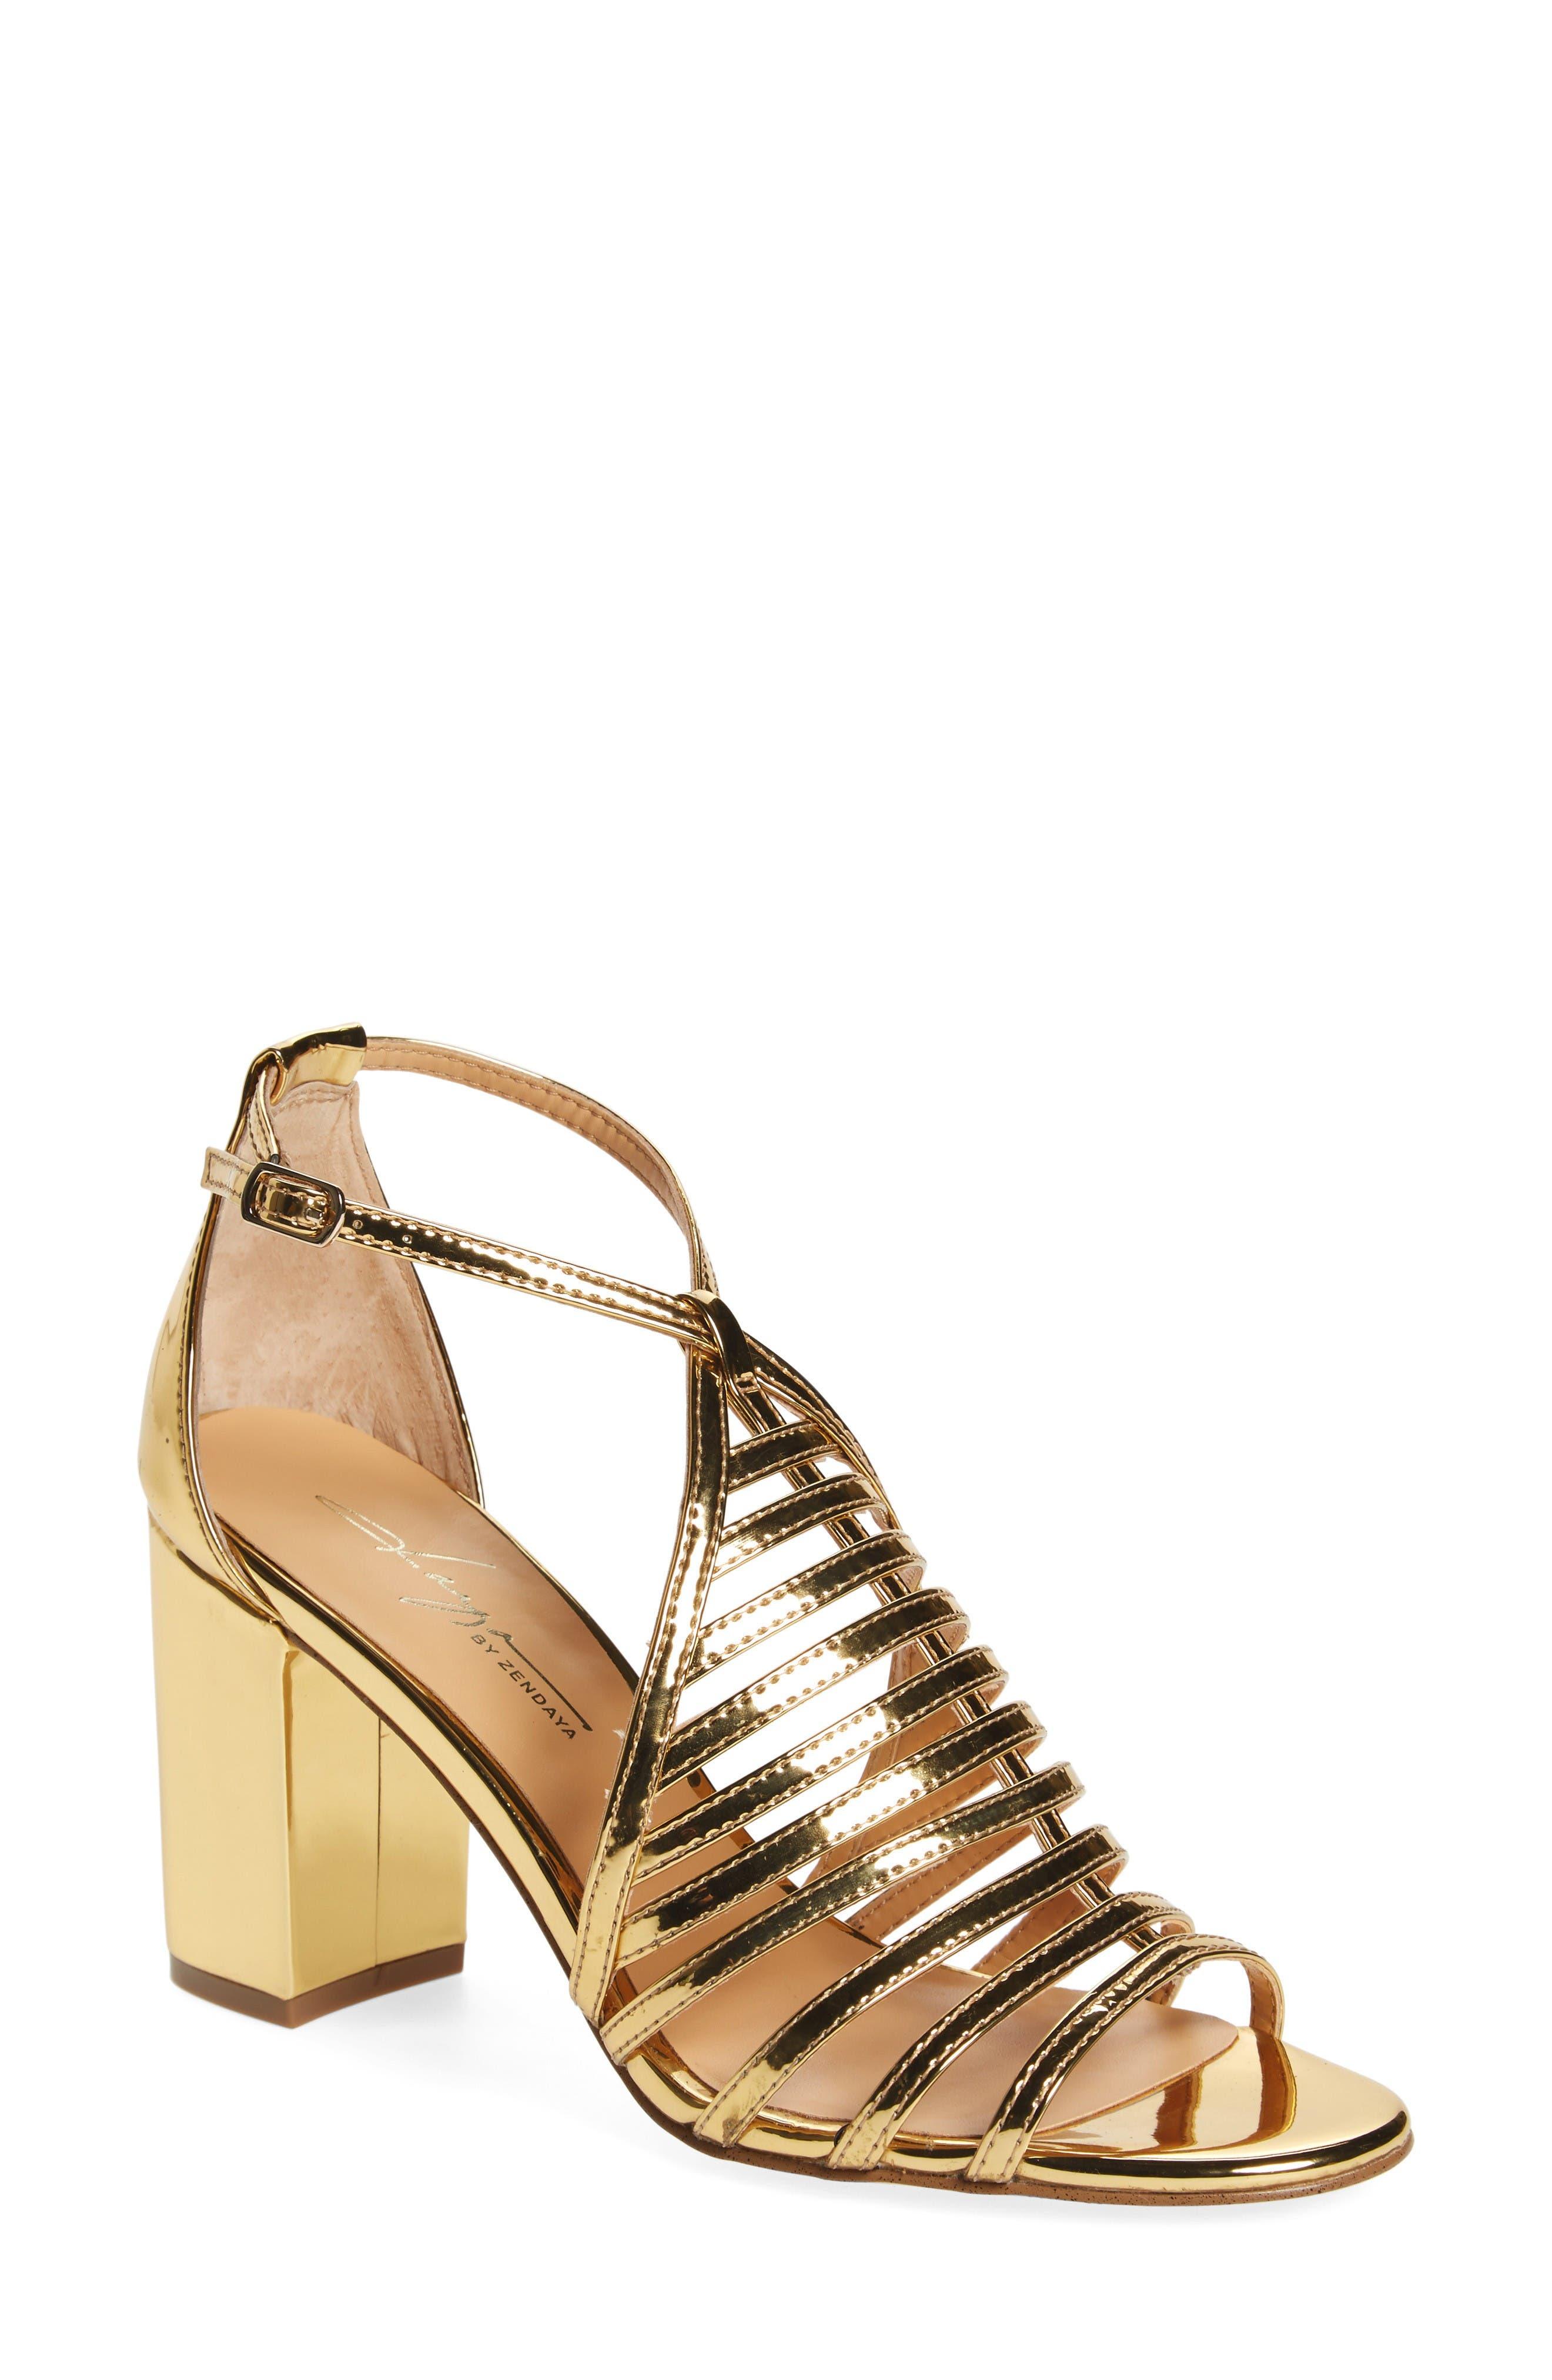 Alternate Image 1 Selected - Daya by Zendaya Soda Block Heel Sandal (Women)